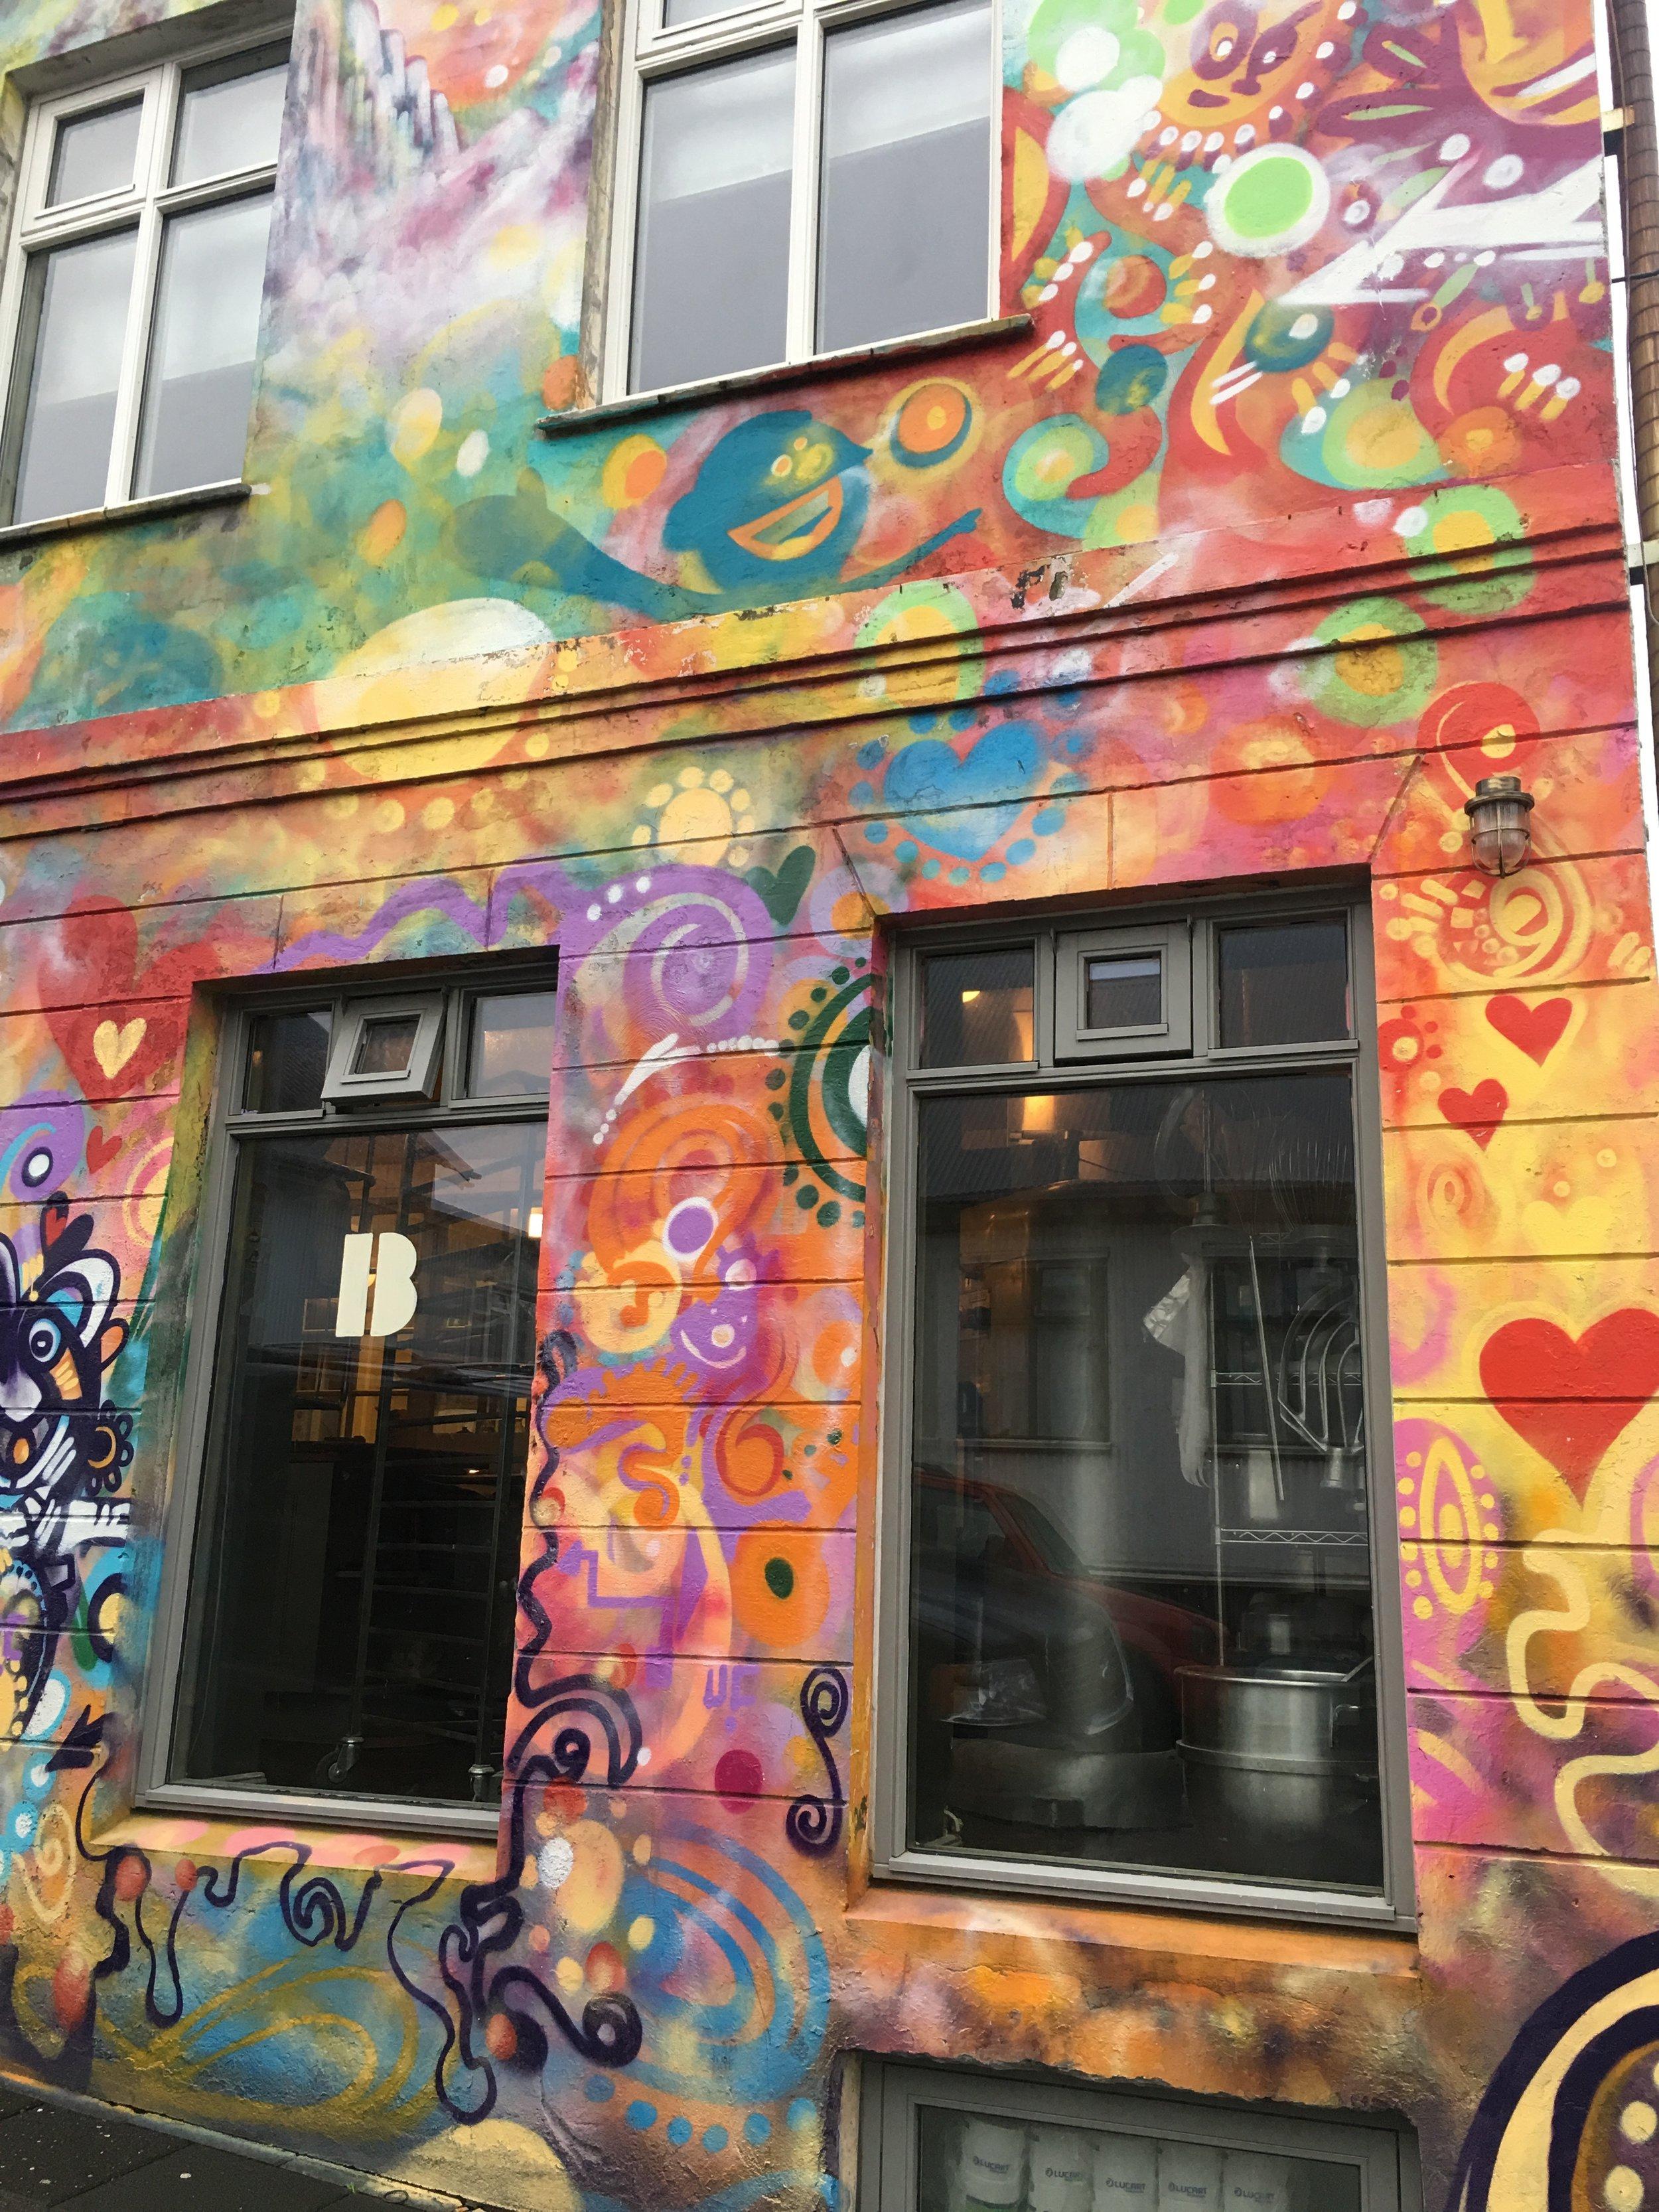 Rainbow wall - Colors everywhere